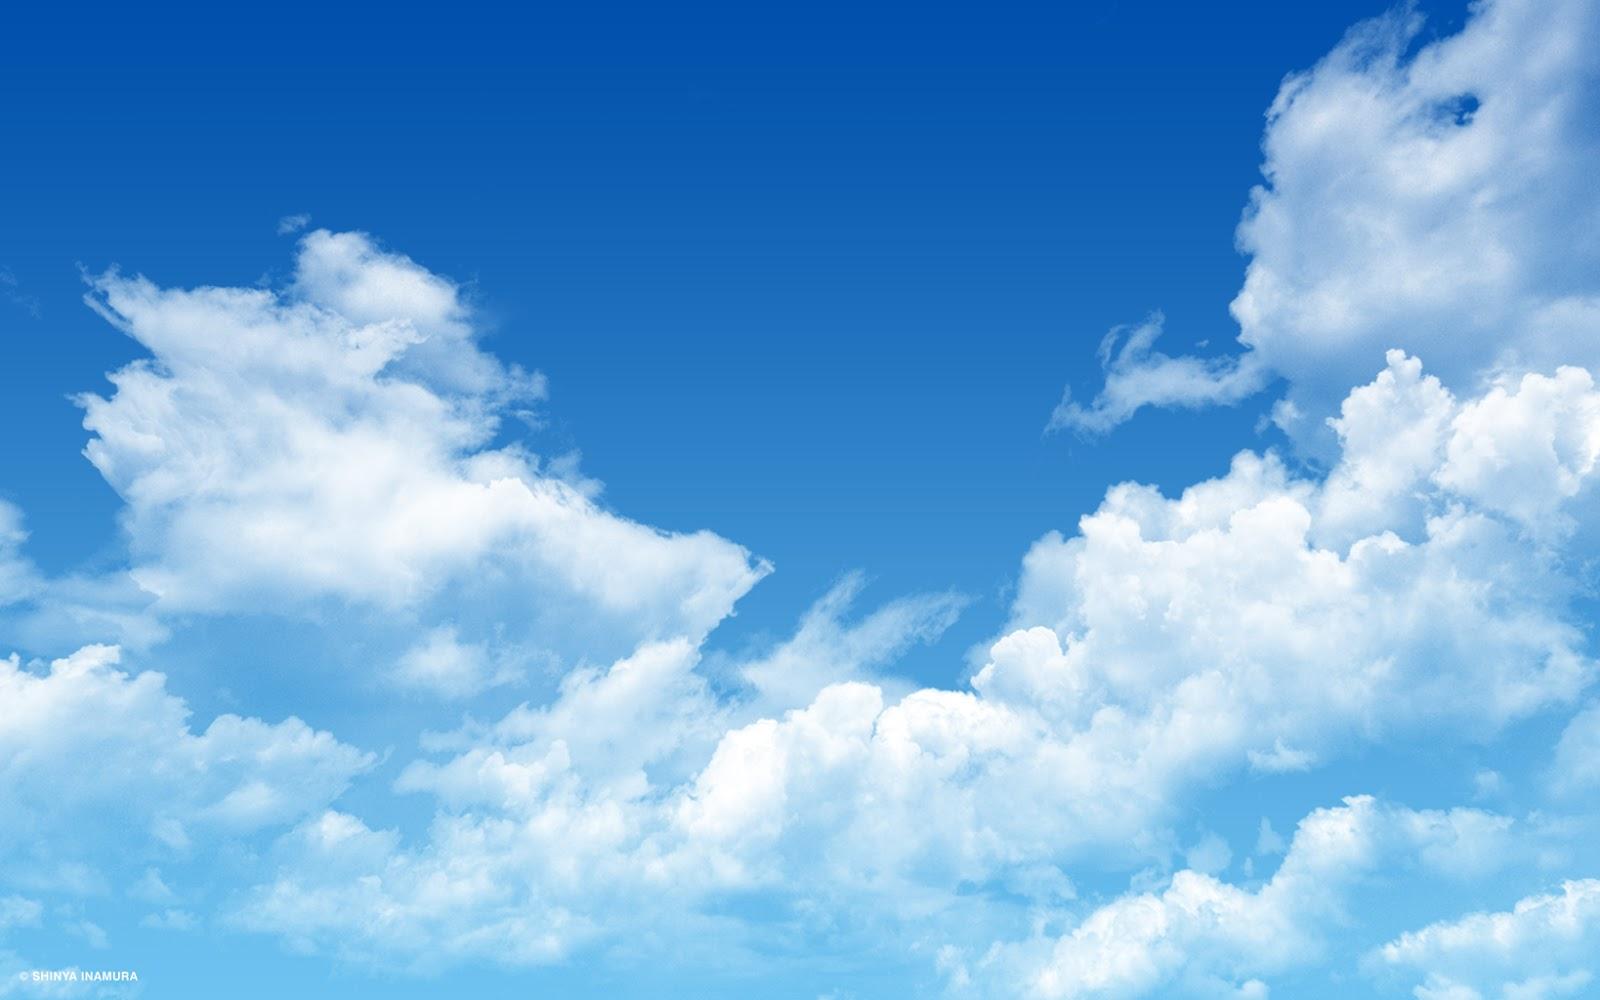 Blue Sky Wallpaper For Desktop Computer ~ Wall2U